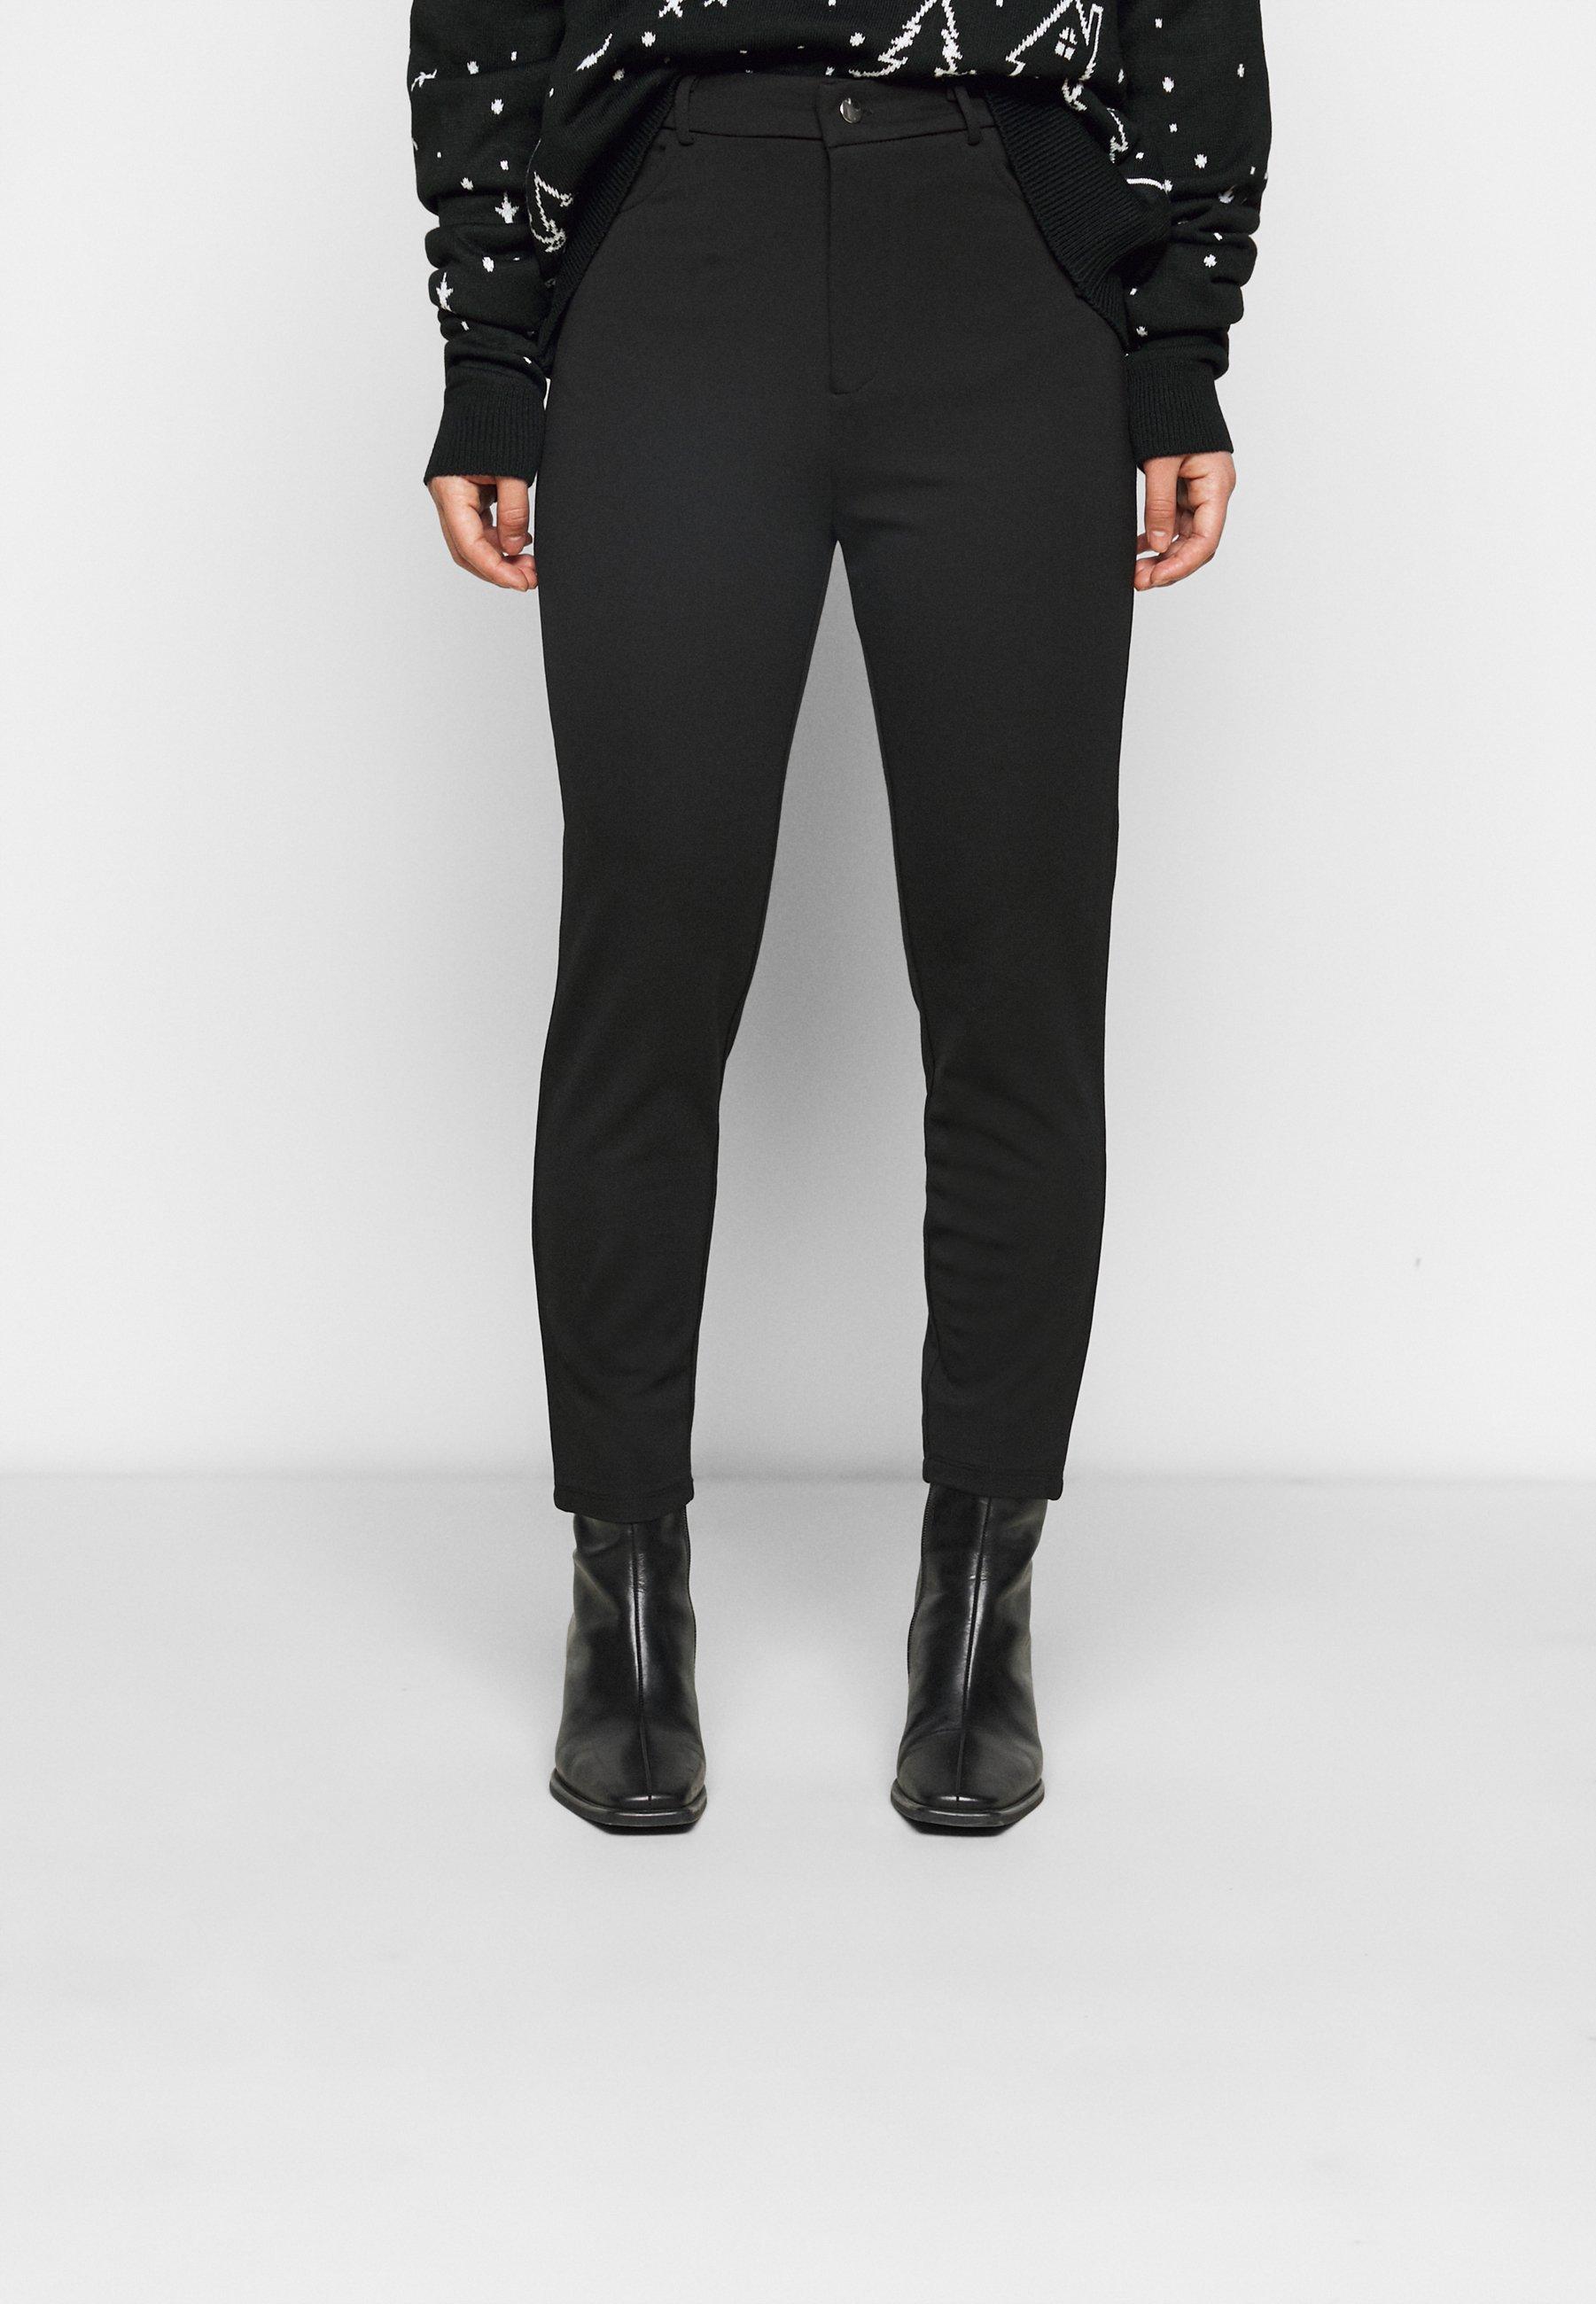 Women HIGH WAIST 5 pockets PUNTO trousers - Leggings - Trousers